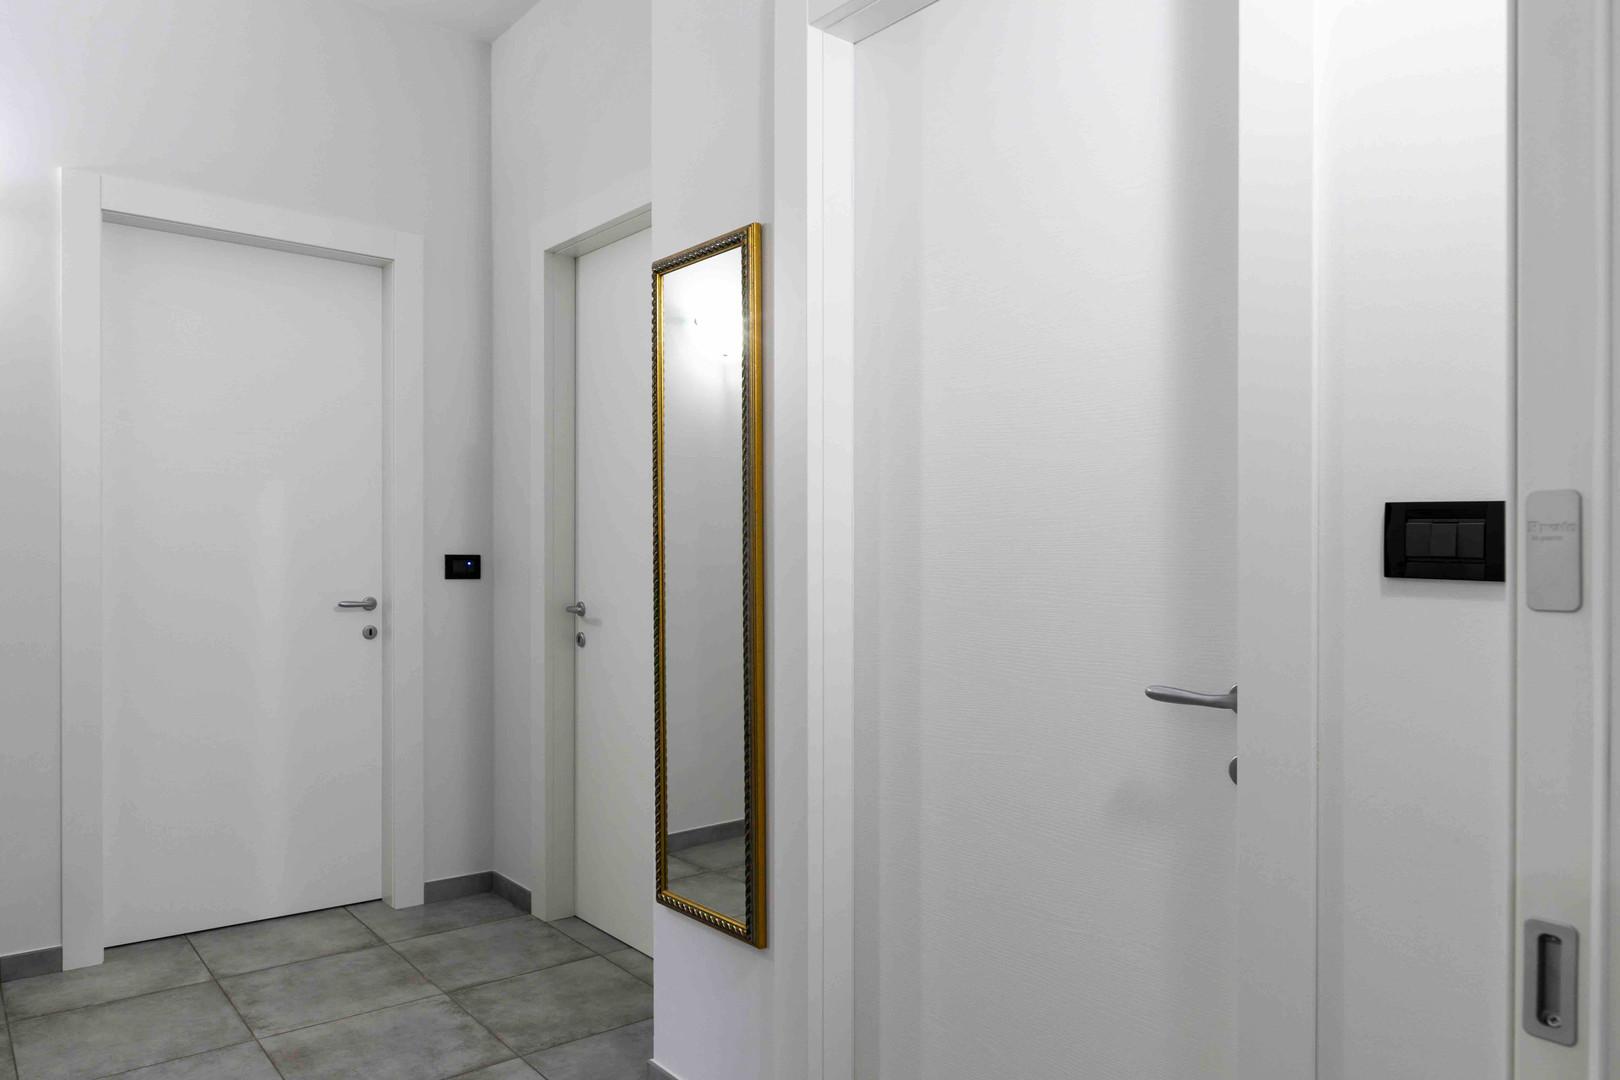 porta interna bianca liscia3.jpg